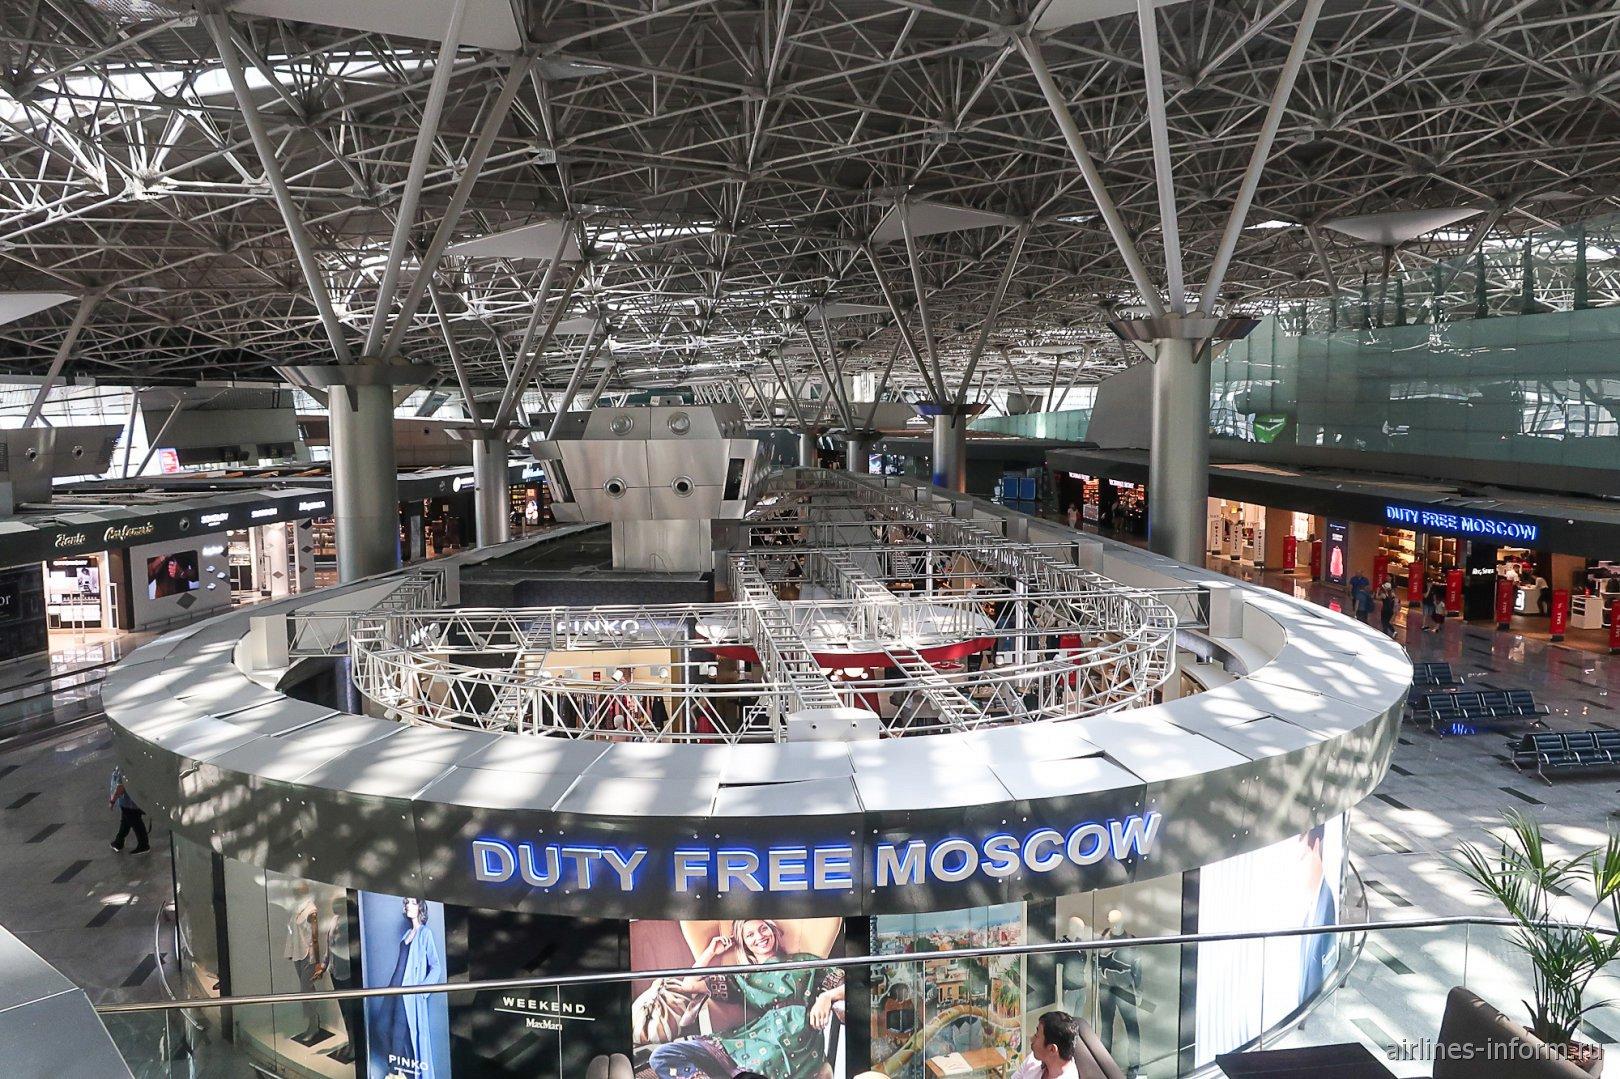 Магазины Duty Free в терминале А аэропорта Внуково